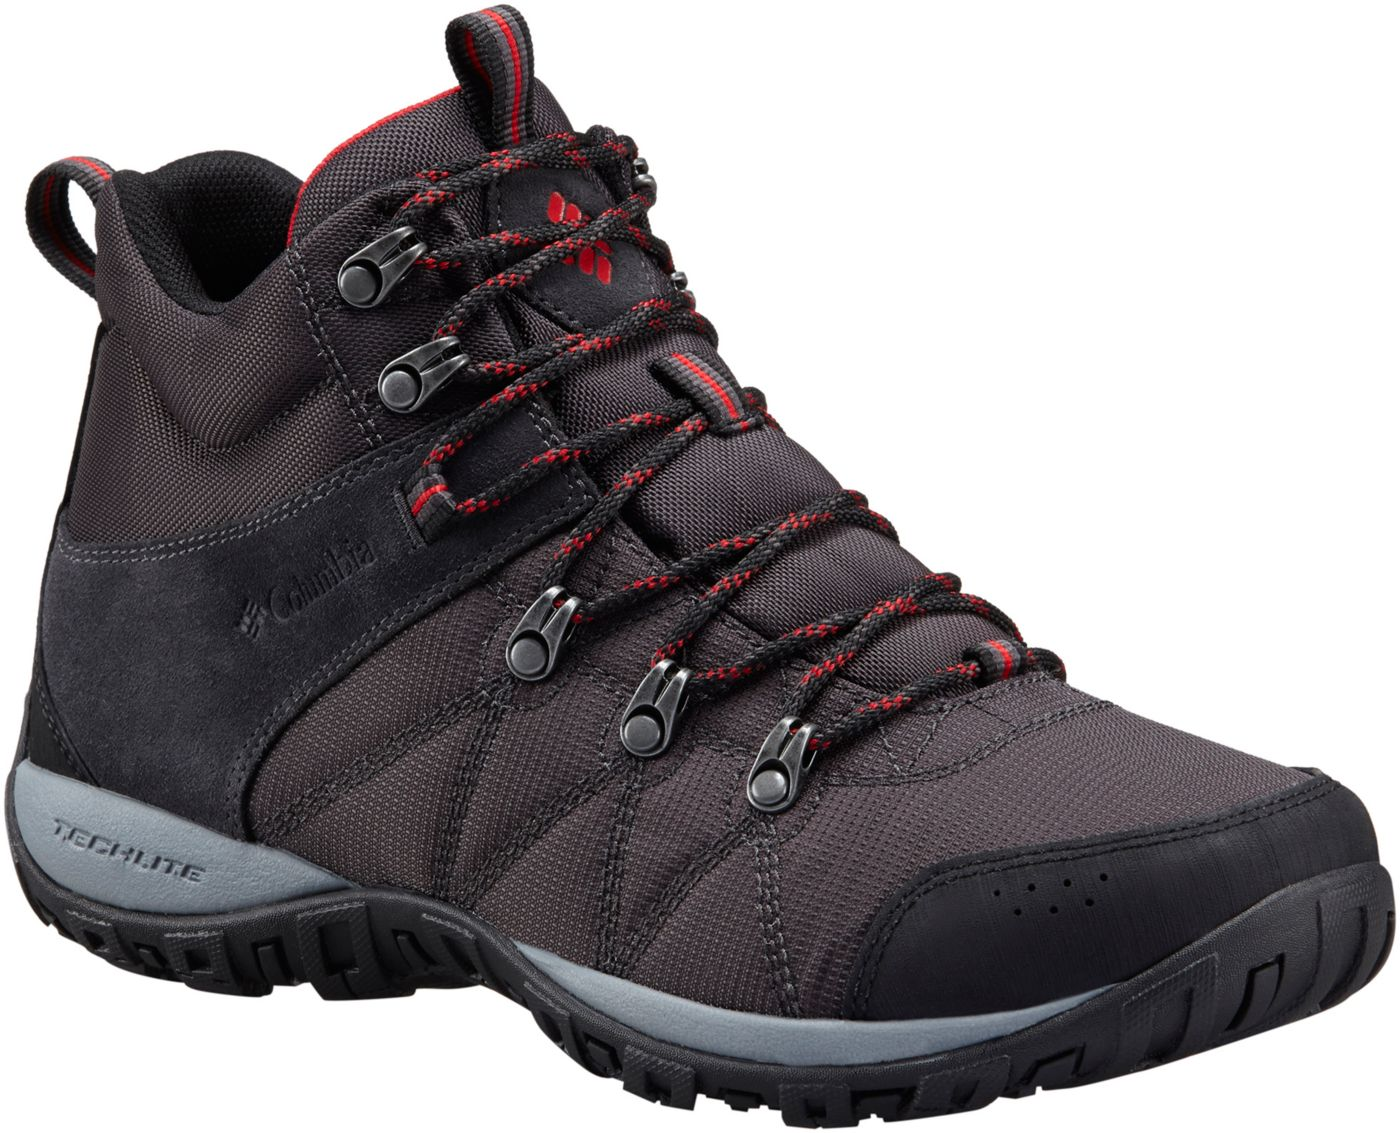 Columbia Men's Peakfreak Venture Mid LT Waterproof Hiking Boots